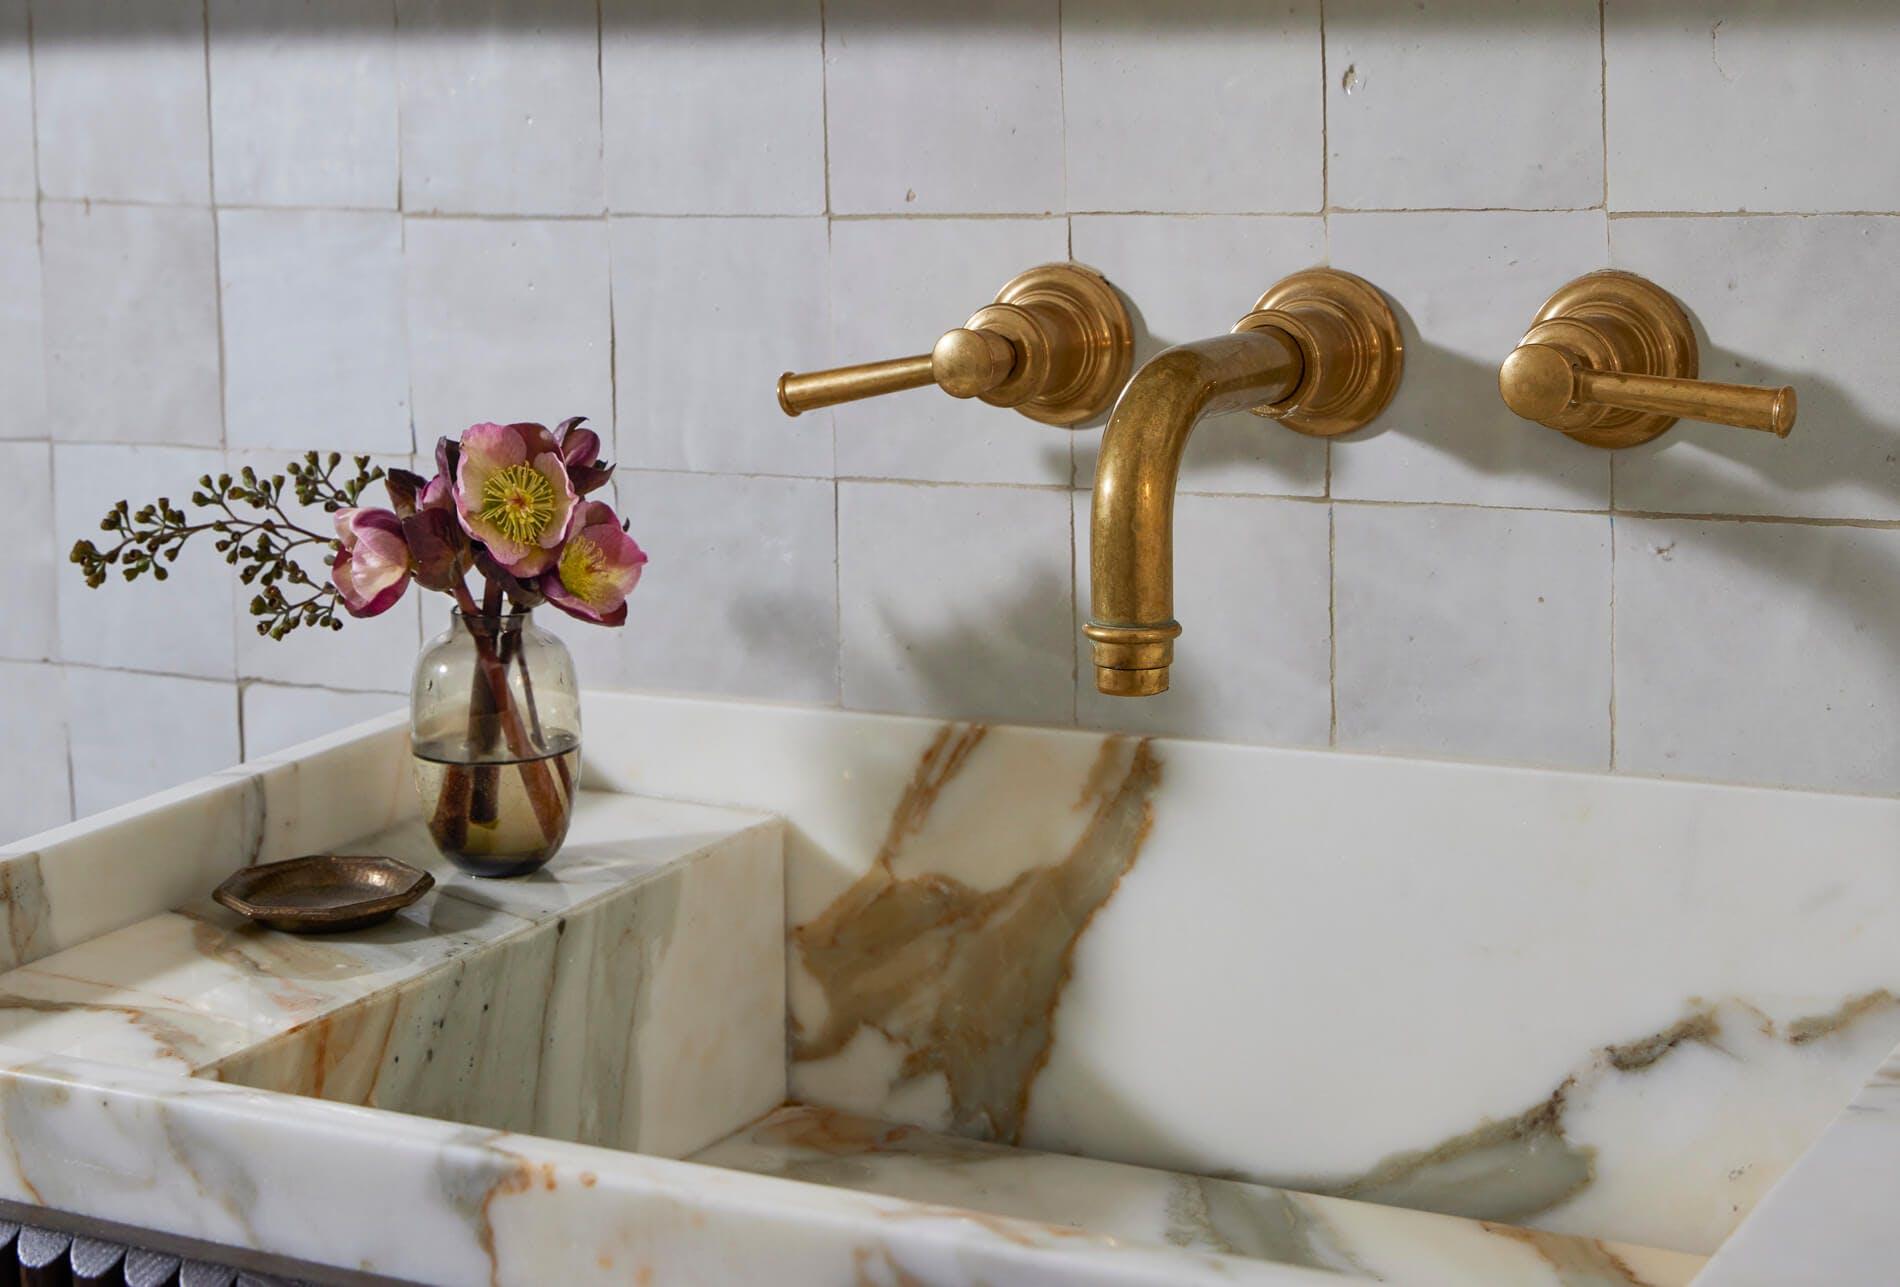 Bathroom basin close up